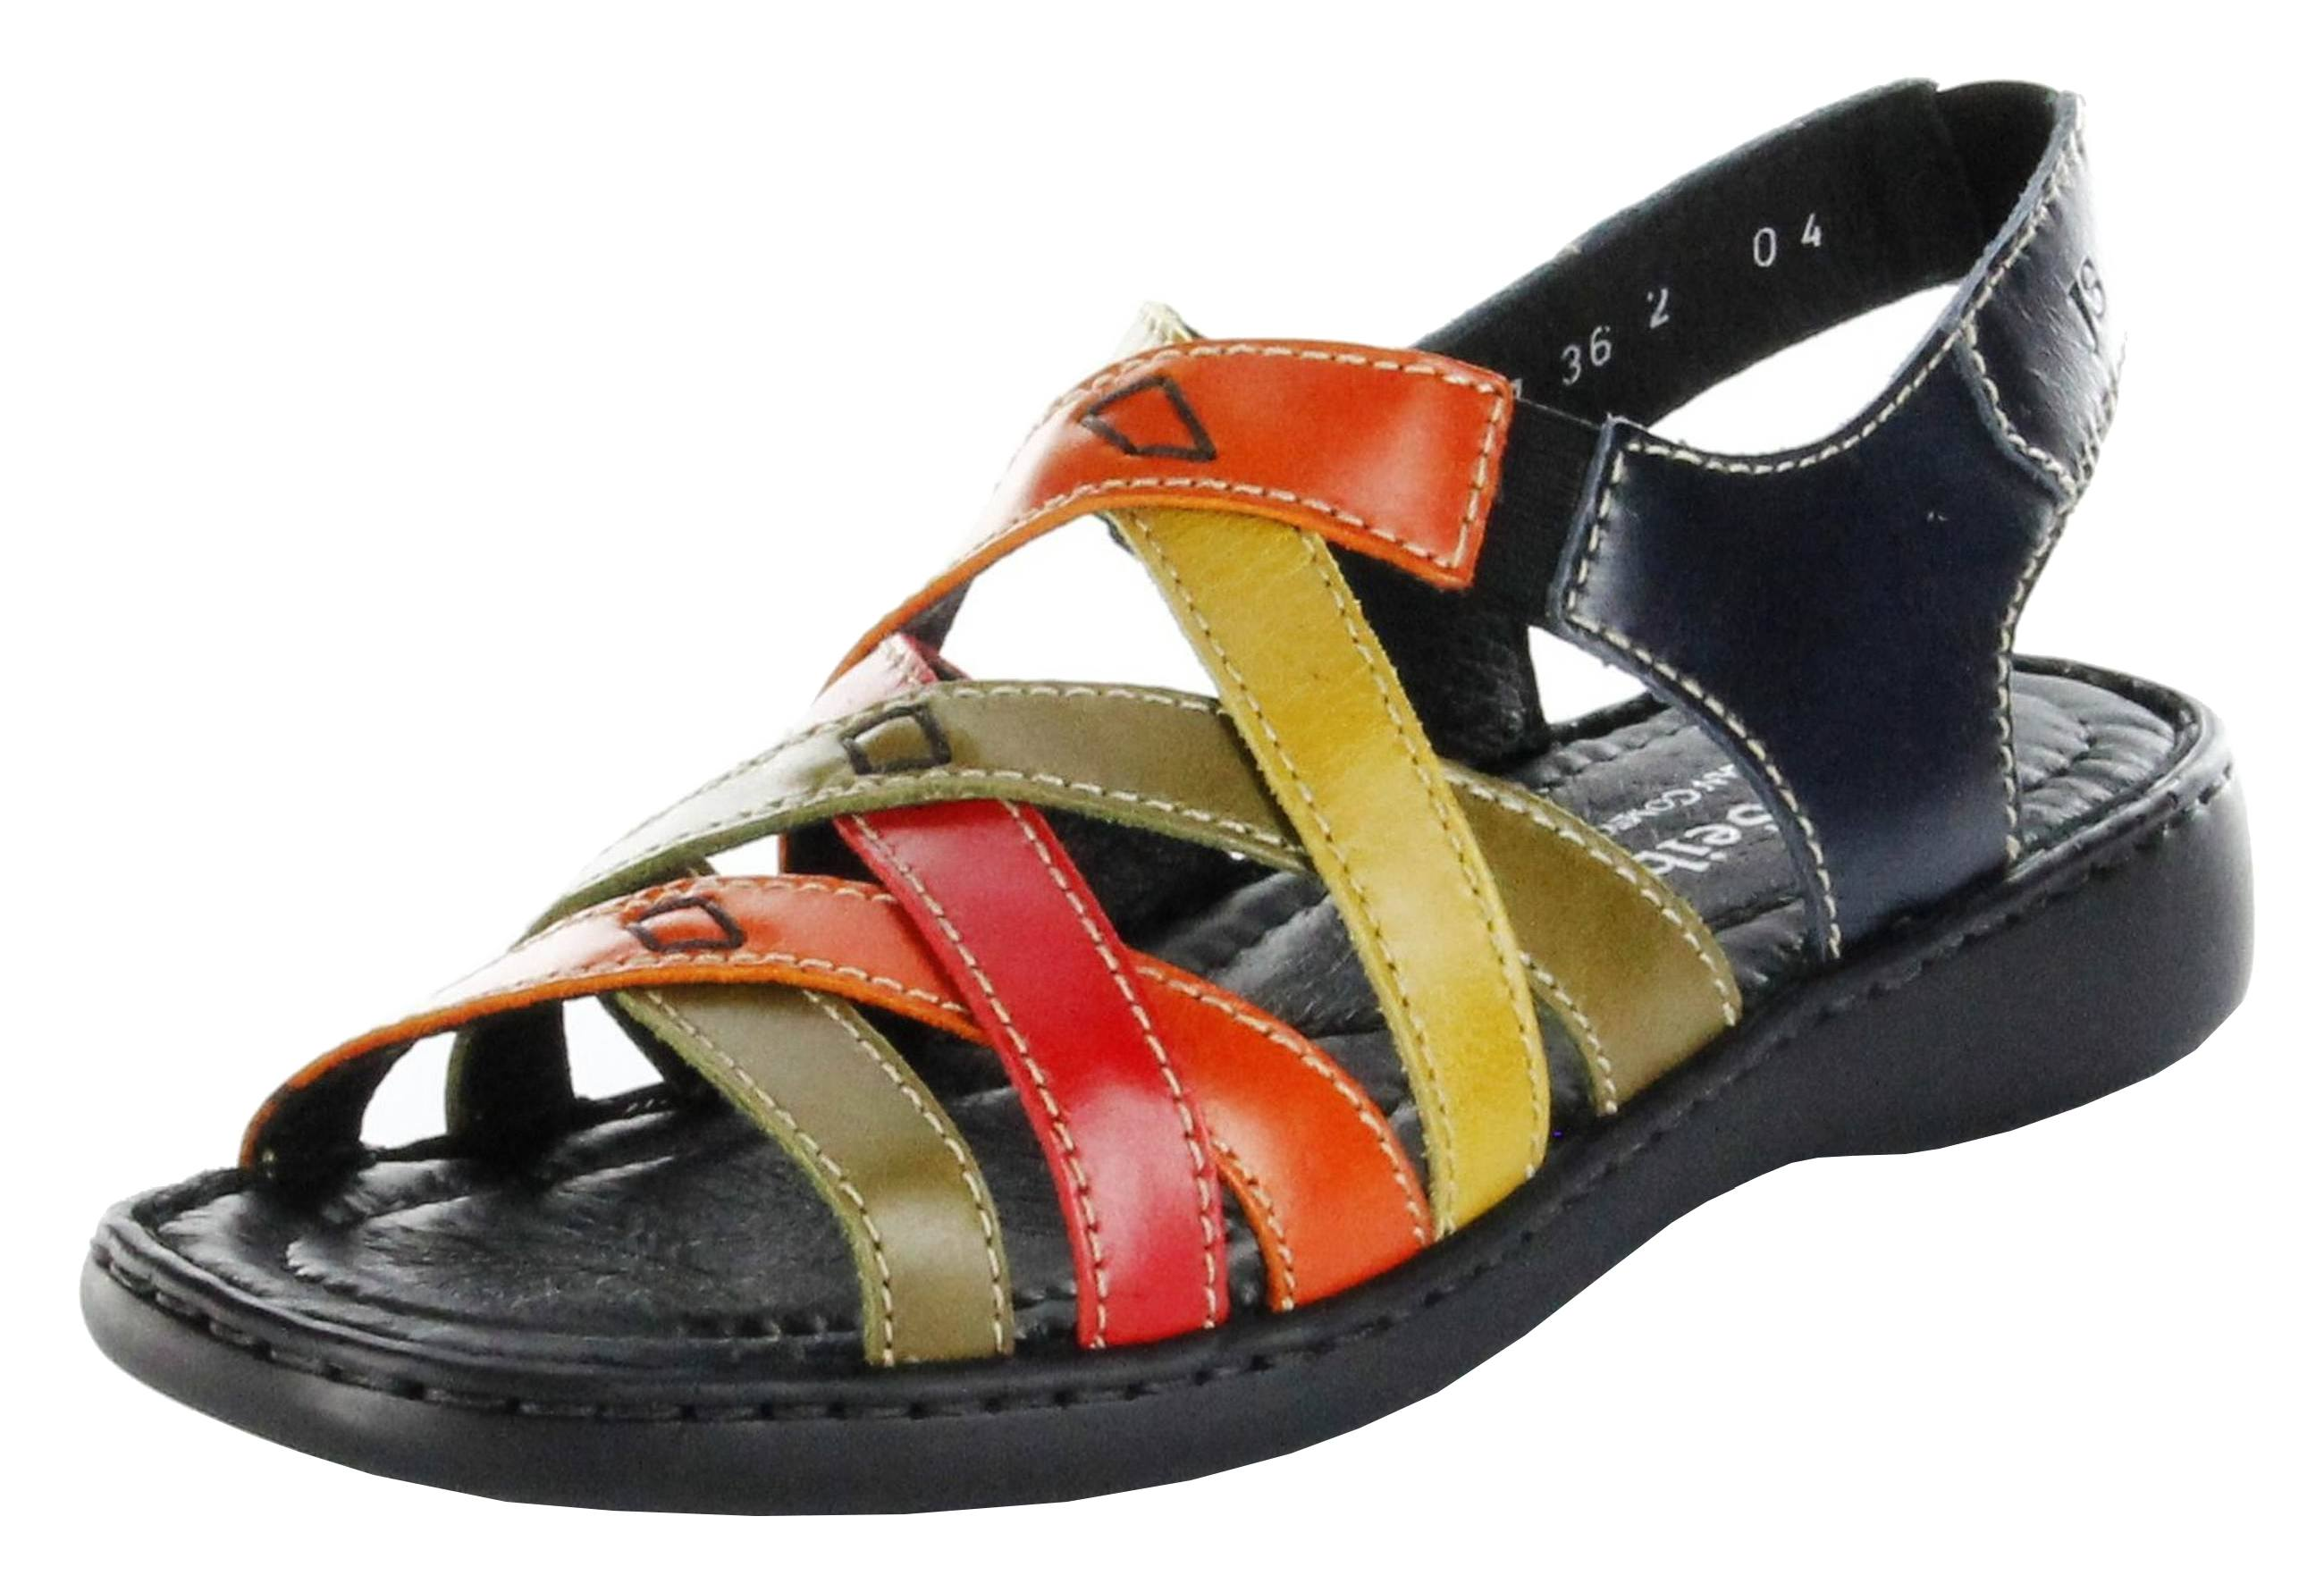 designer fashion later factory authentic Josef Seibel Sandaletten multicolor Lederdeck Keil Leder Damen Schuhe Lisa  03